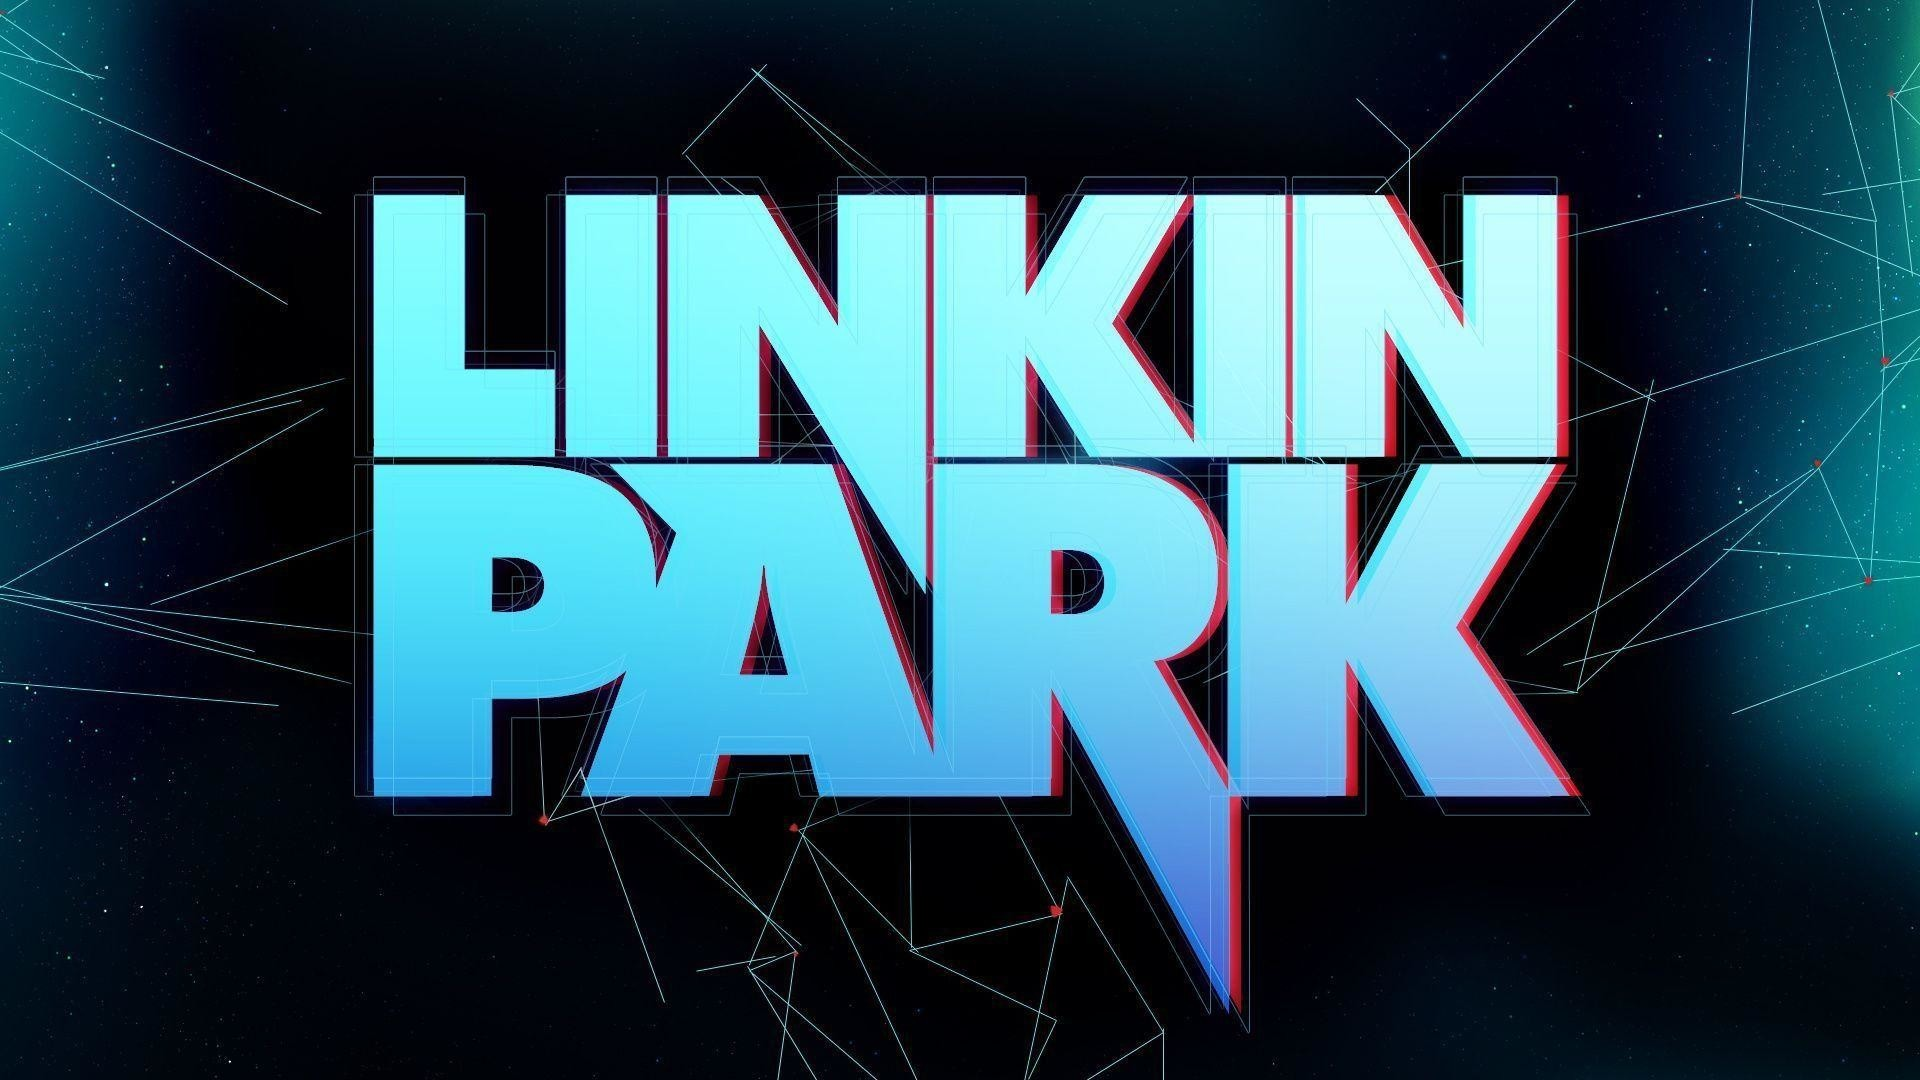 Linkin Park Wallpaper 2018 61 Pictures